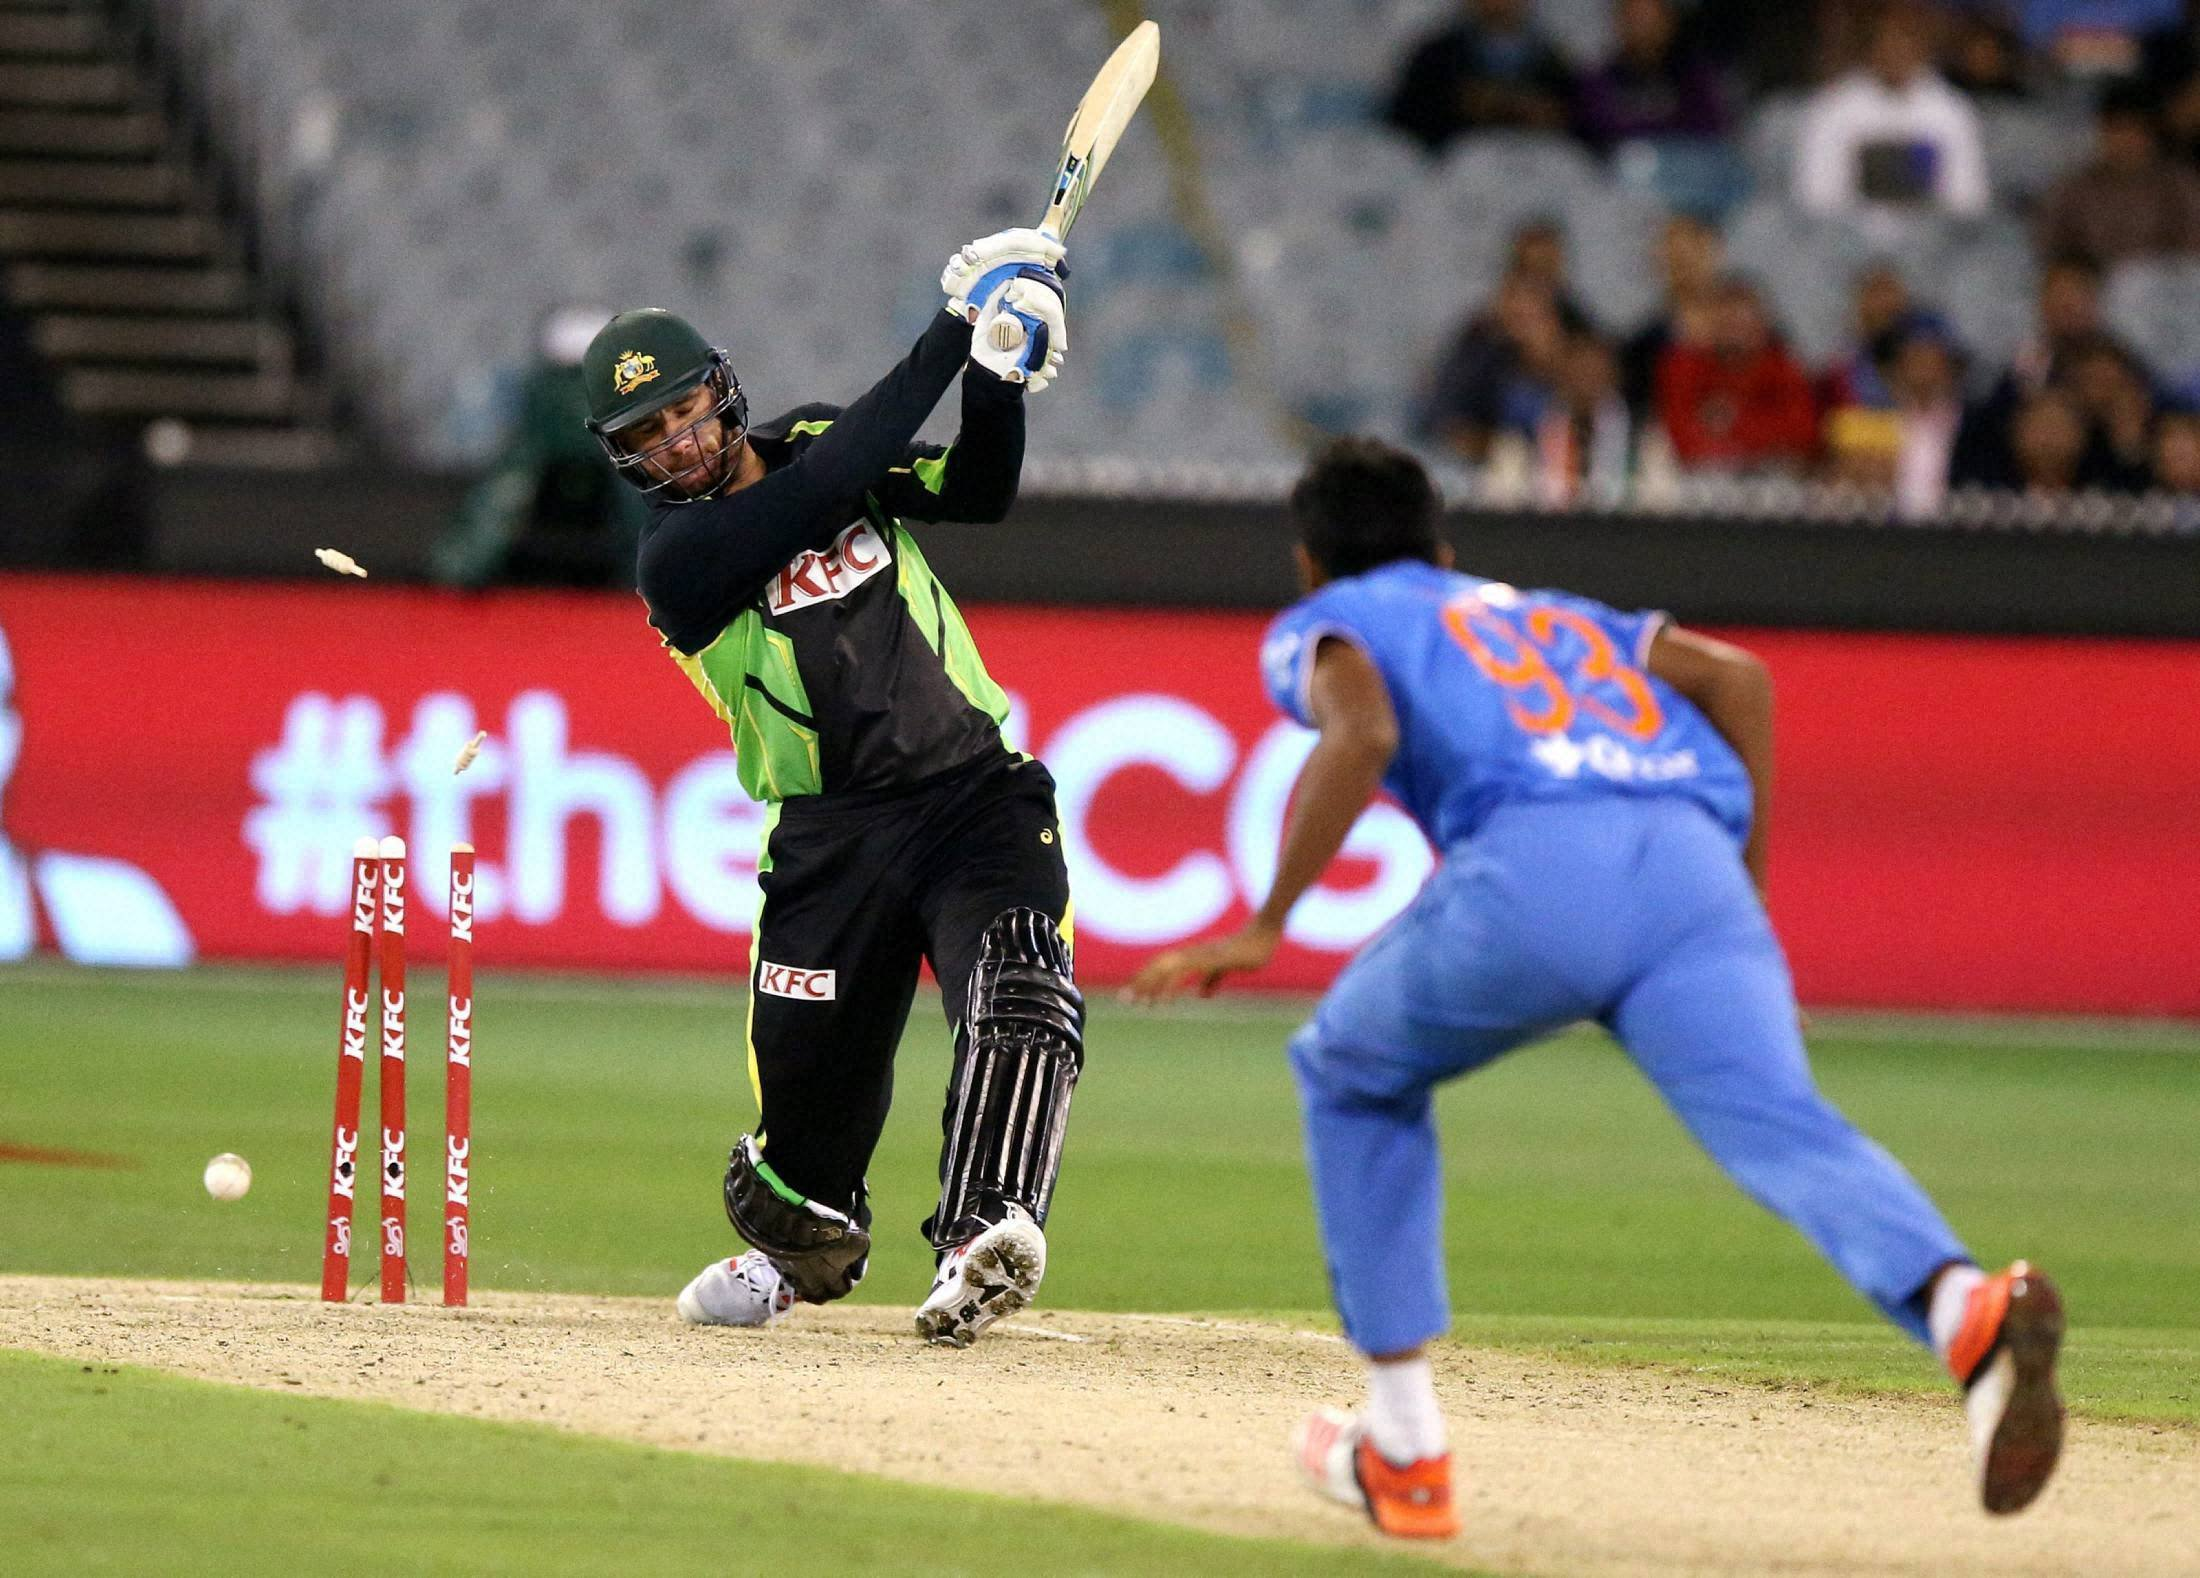 Jasprit Bumrah has best yorker in world cricket, says Pakistan legend Wasim Akram - Bhatkallys.com